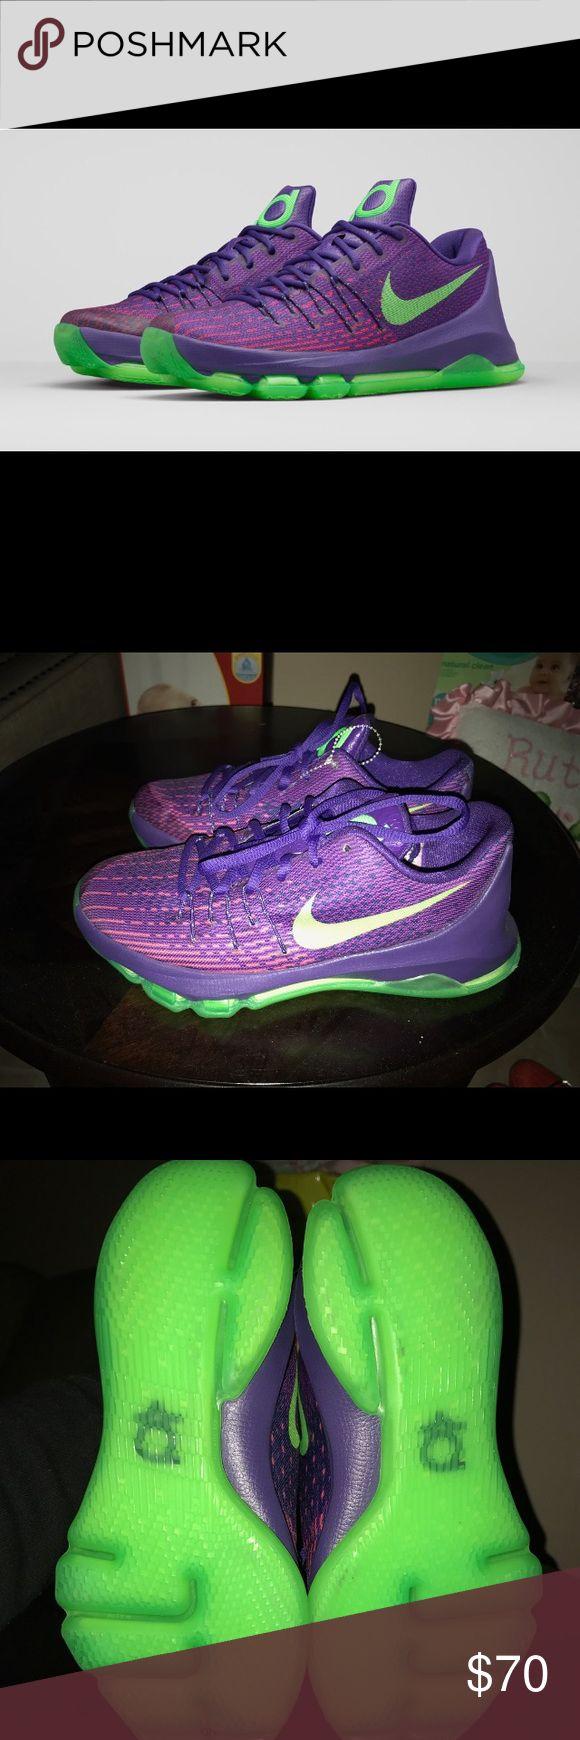 Kds 8 joker Brand new Nike Shoes Sneakers